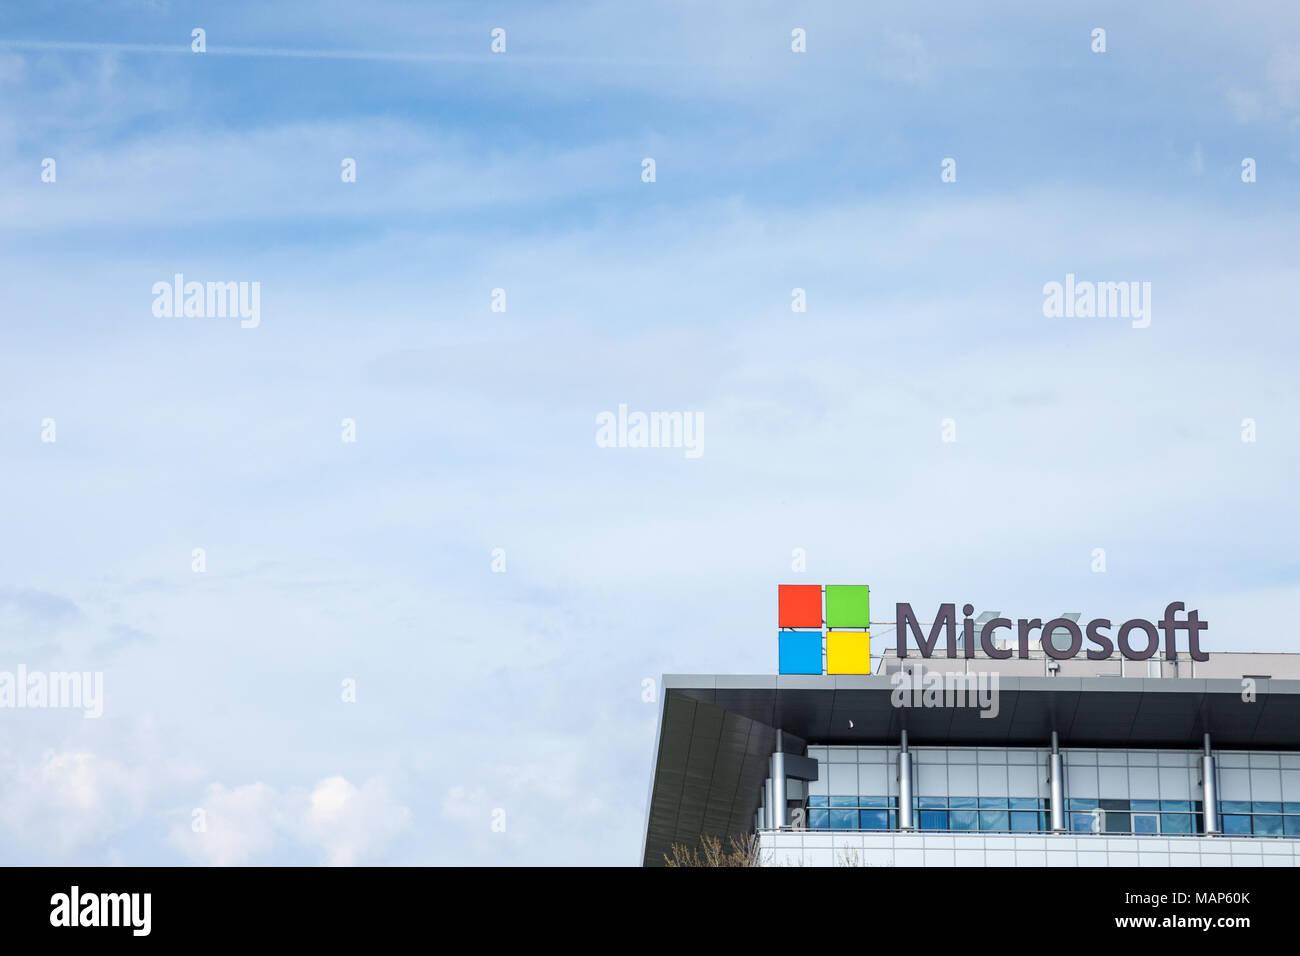 BELGRADE, SERBIA - MARCH 30, 2018: Microsoft logo on their main office for Serbia (Microsoft Development Center). Microsoft Corporation one of the mai - Stock Image